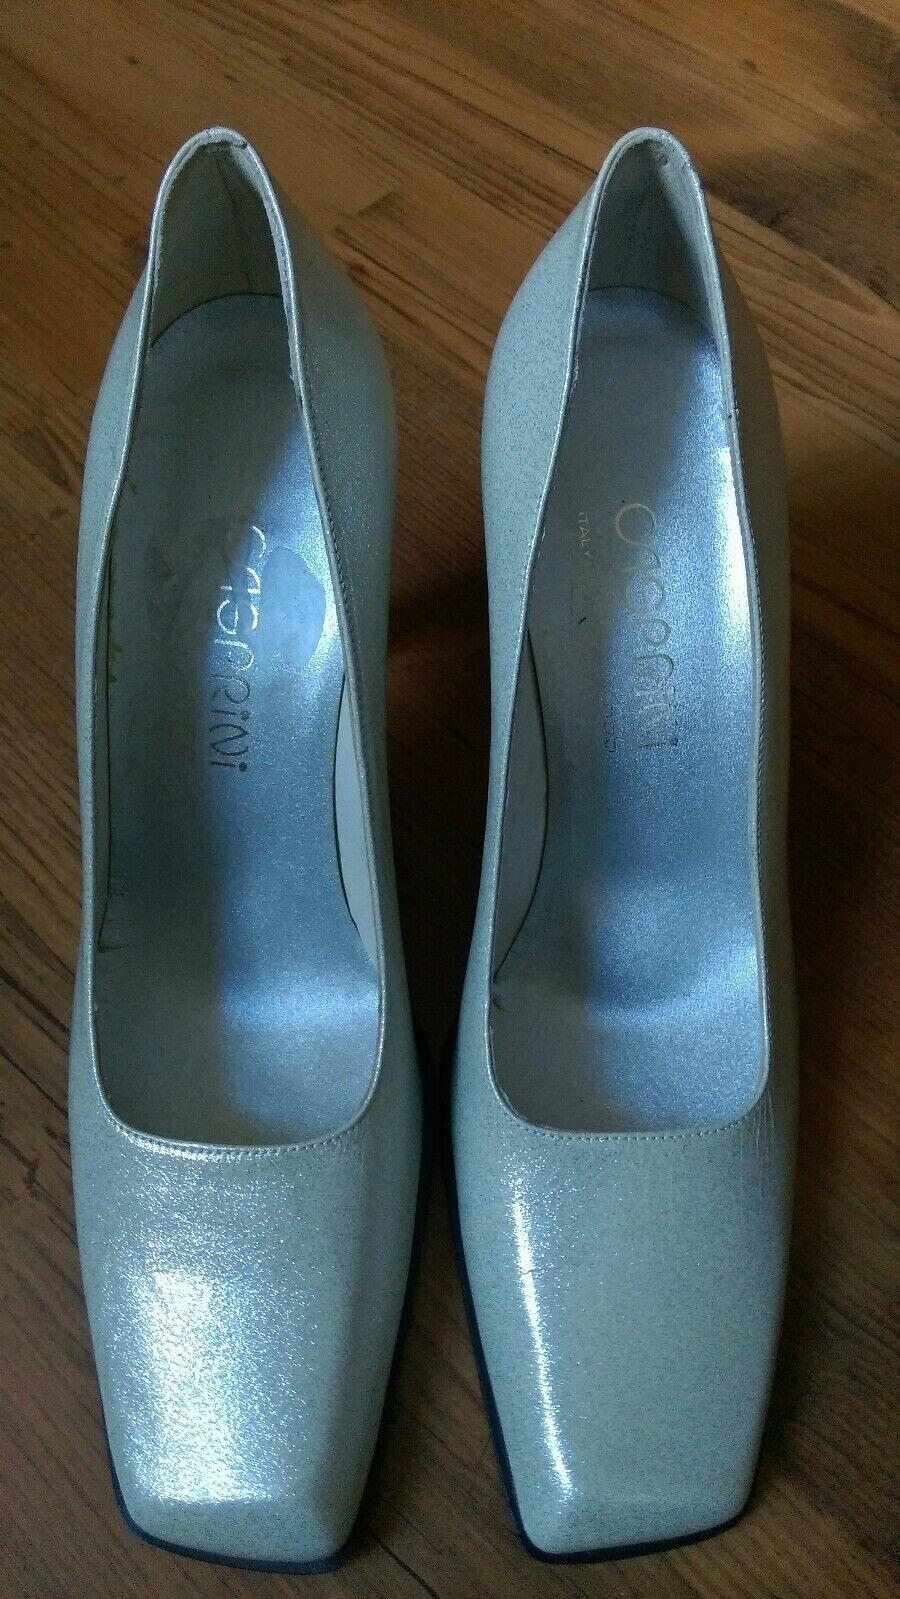 CASPRINI Class Bridal Patent Leather Shoes Size 39.1/2 NEW